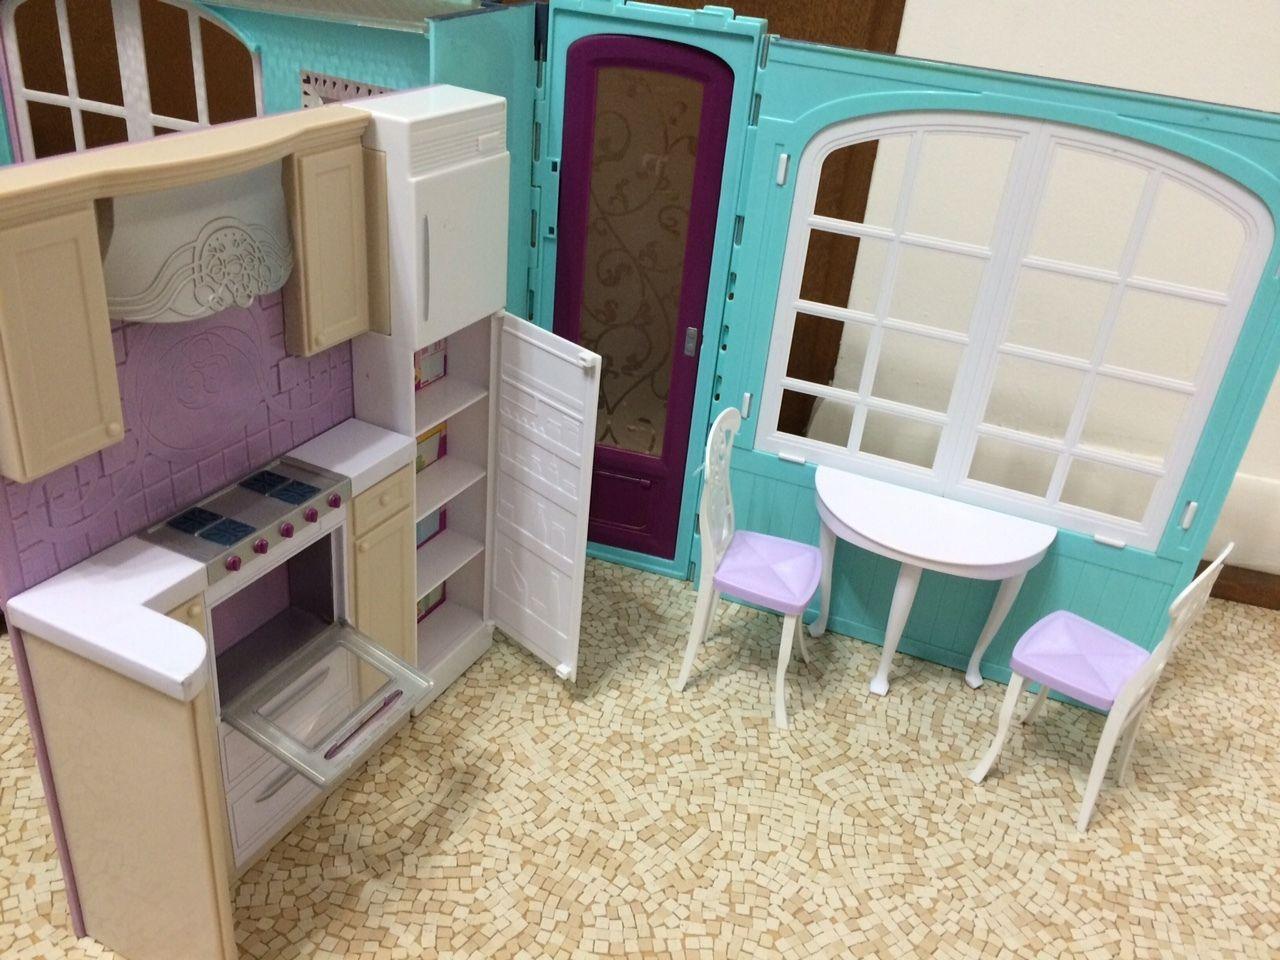 Barbie Kitchen Furniture 2007 Barbie Doll My House Playset Fold Up Dollhouse Kitchen